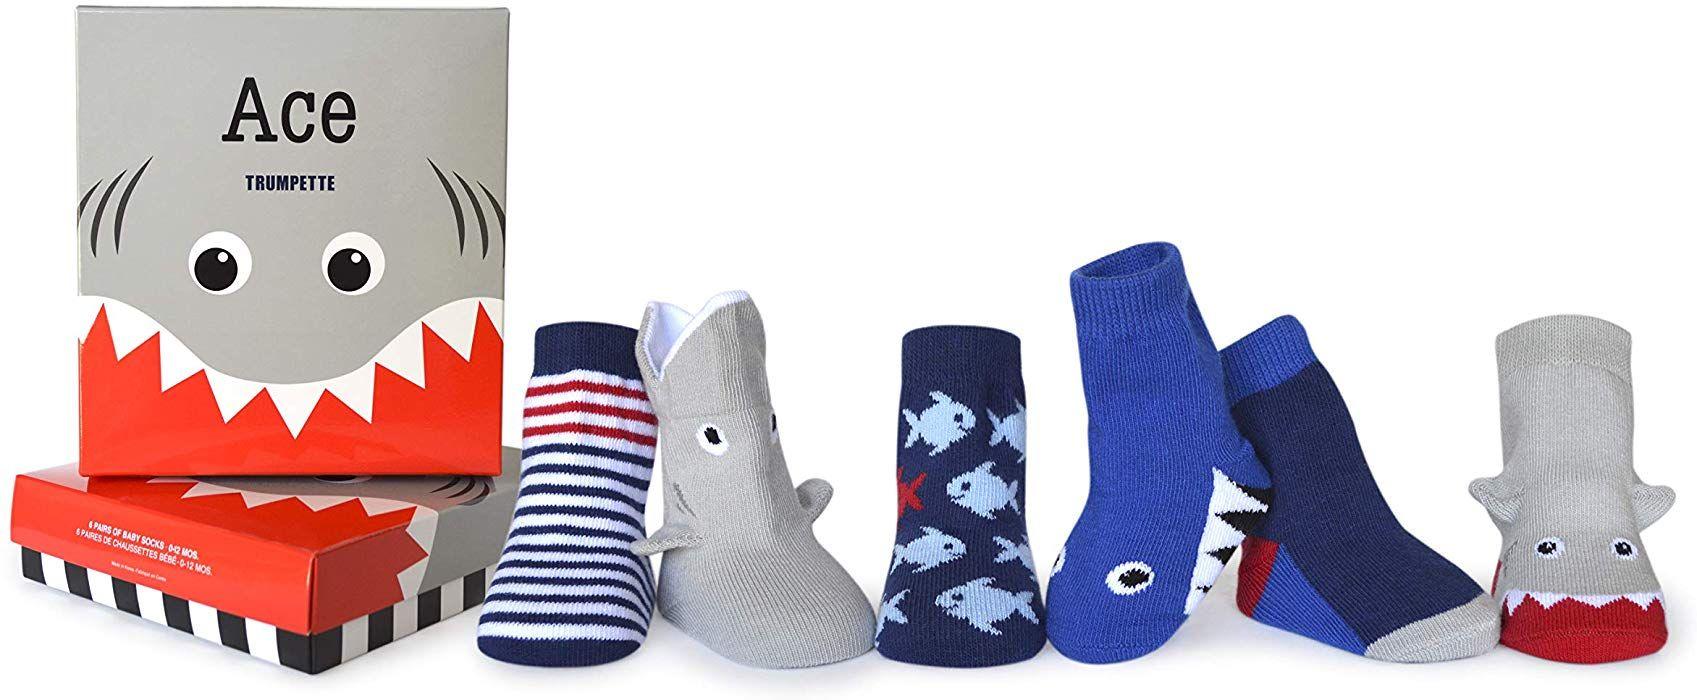 3 Pairs Trumpette unisex-baby Sock Set